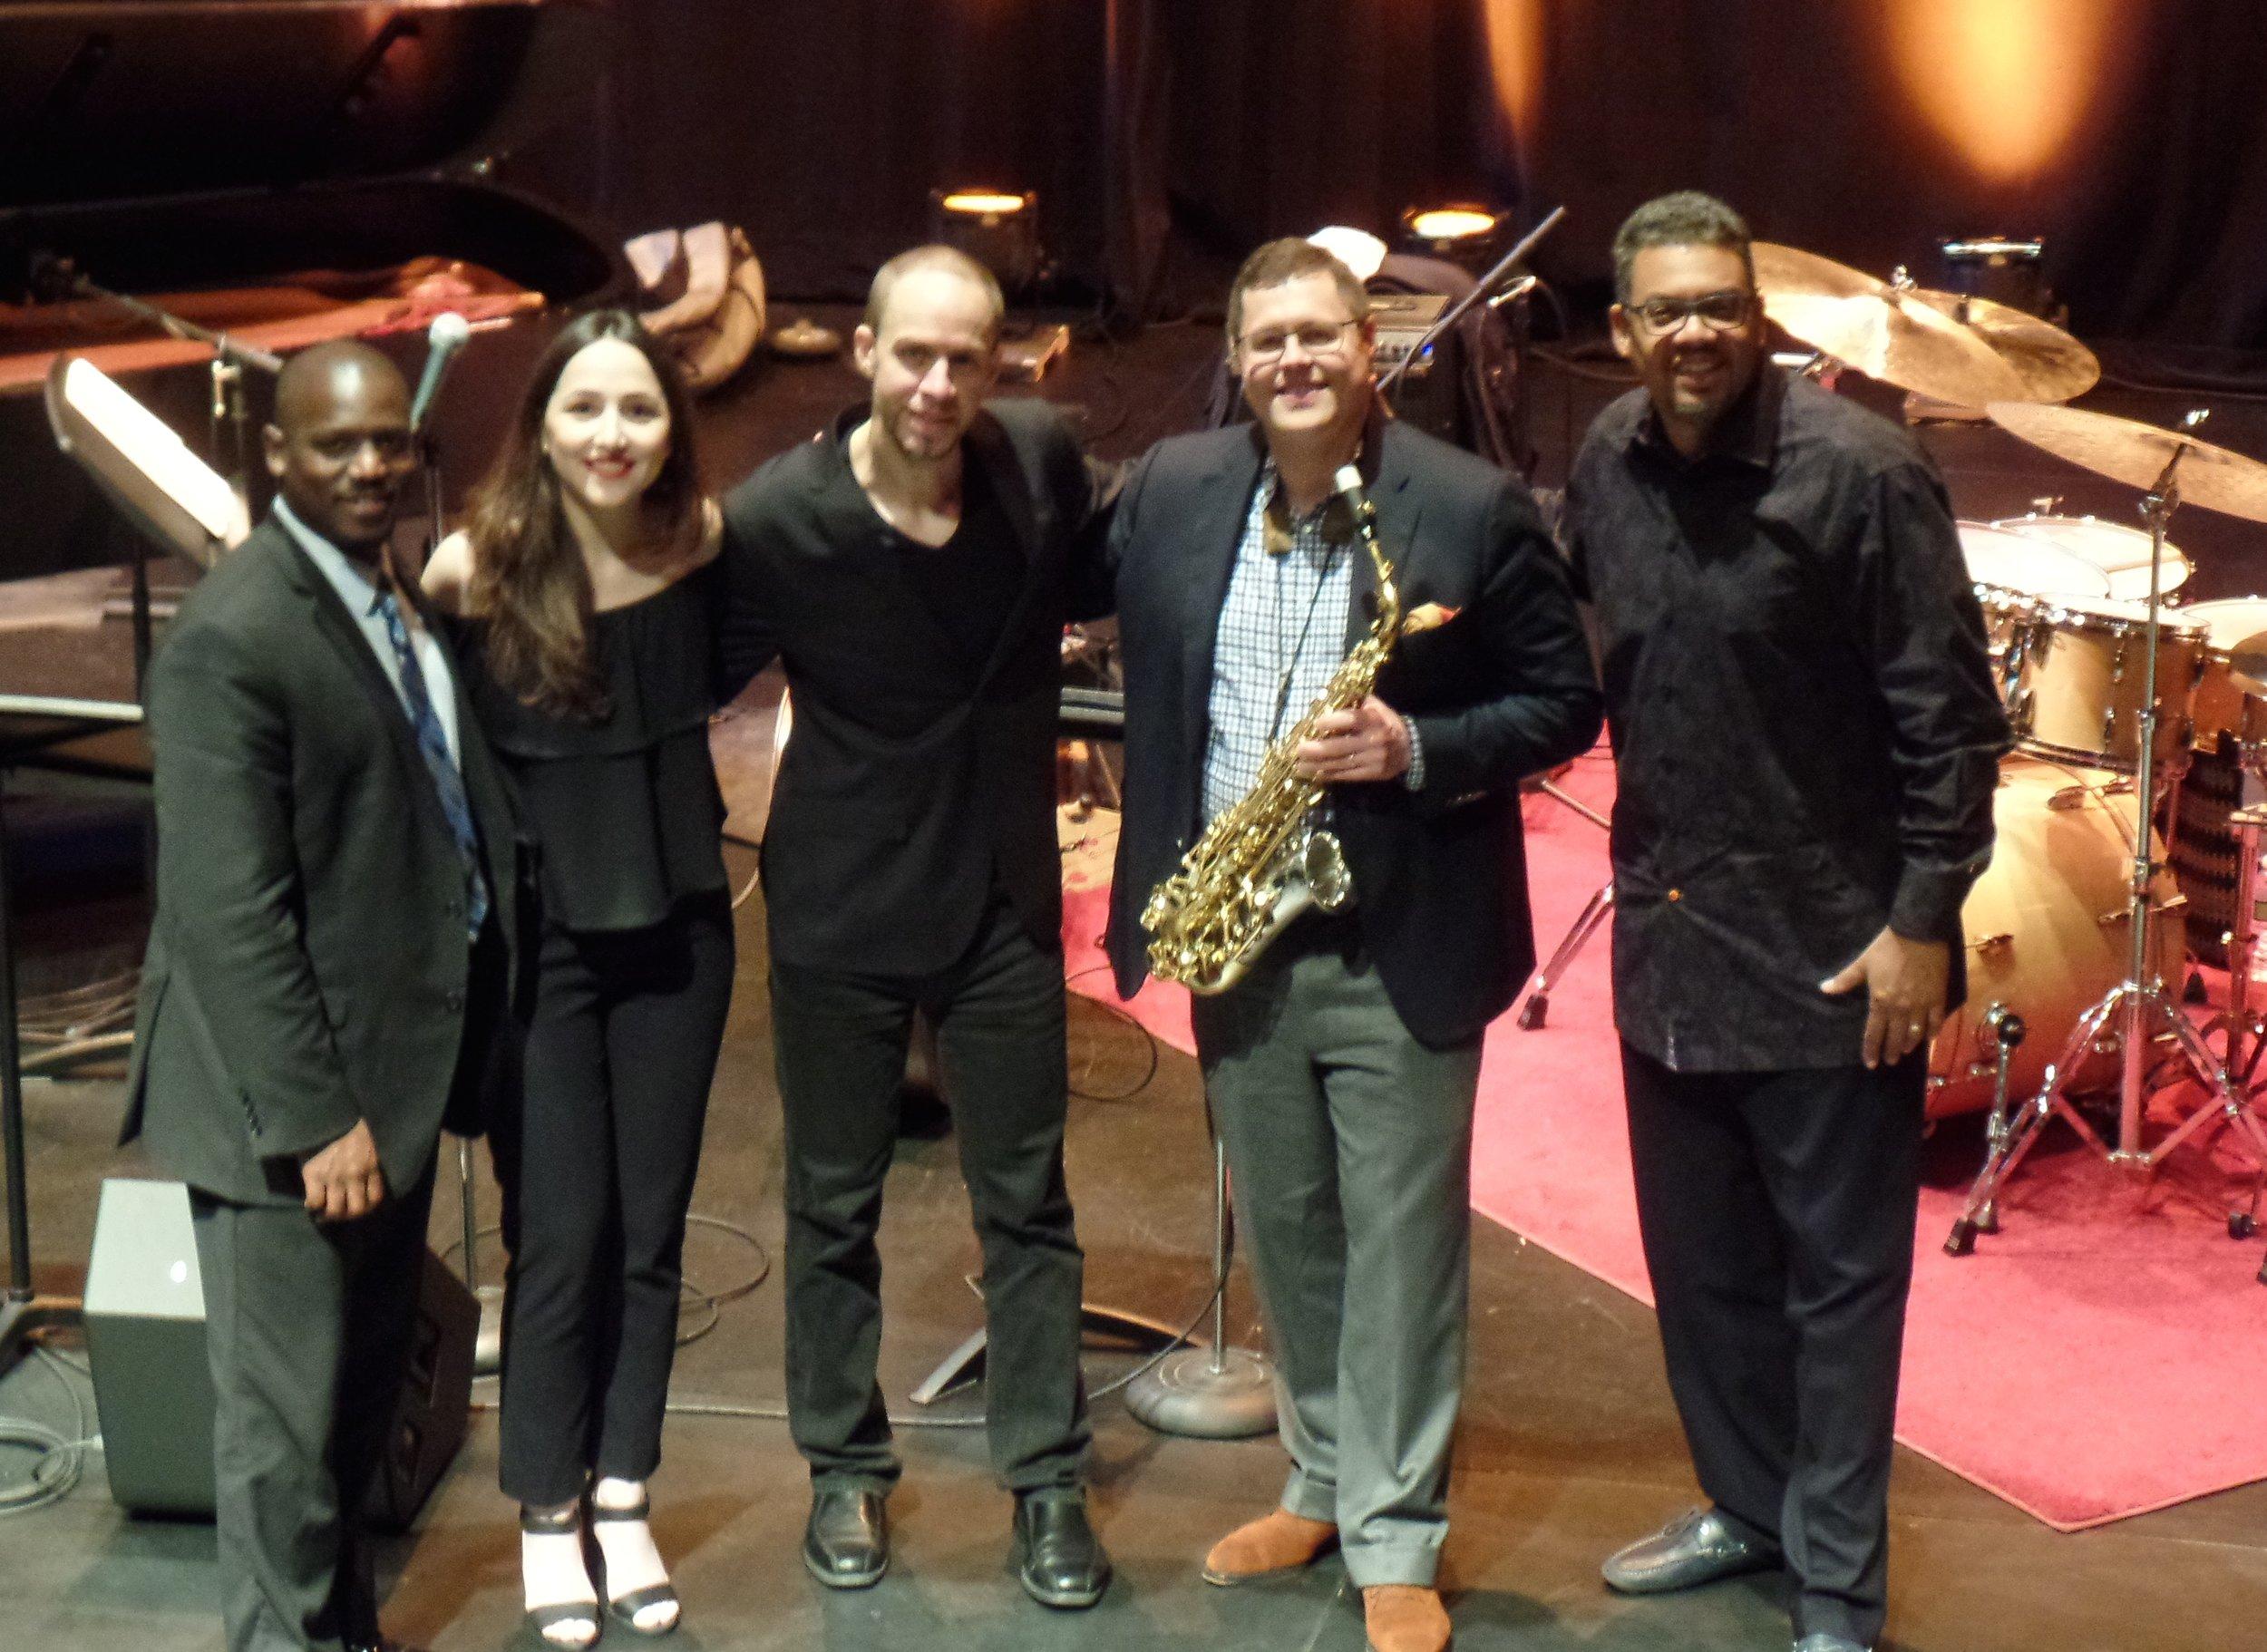 with Alina Engibaryan, Todd Bashore, Brandon McCune, Vince Ector at Williams Center for the Arts 2016